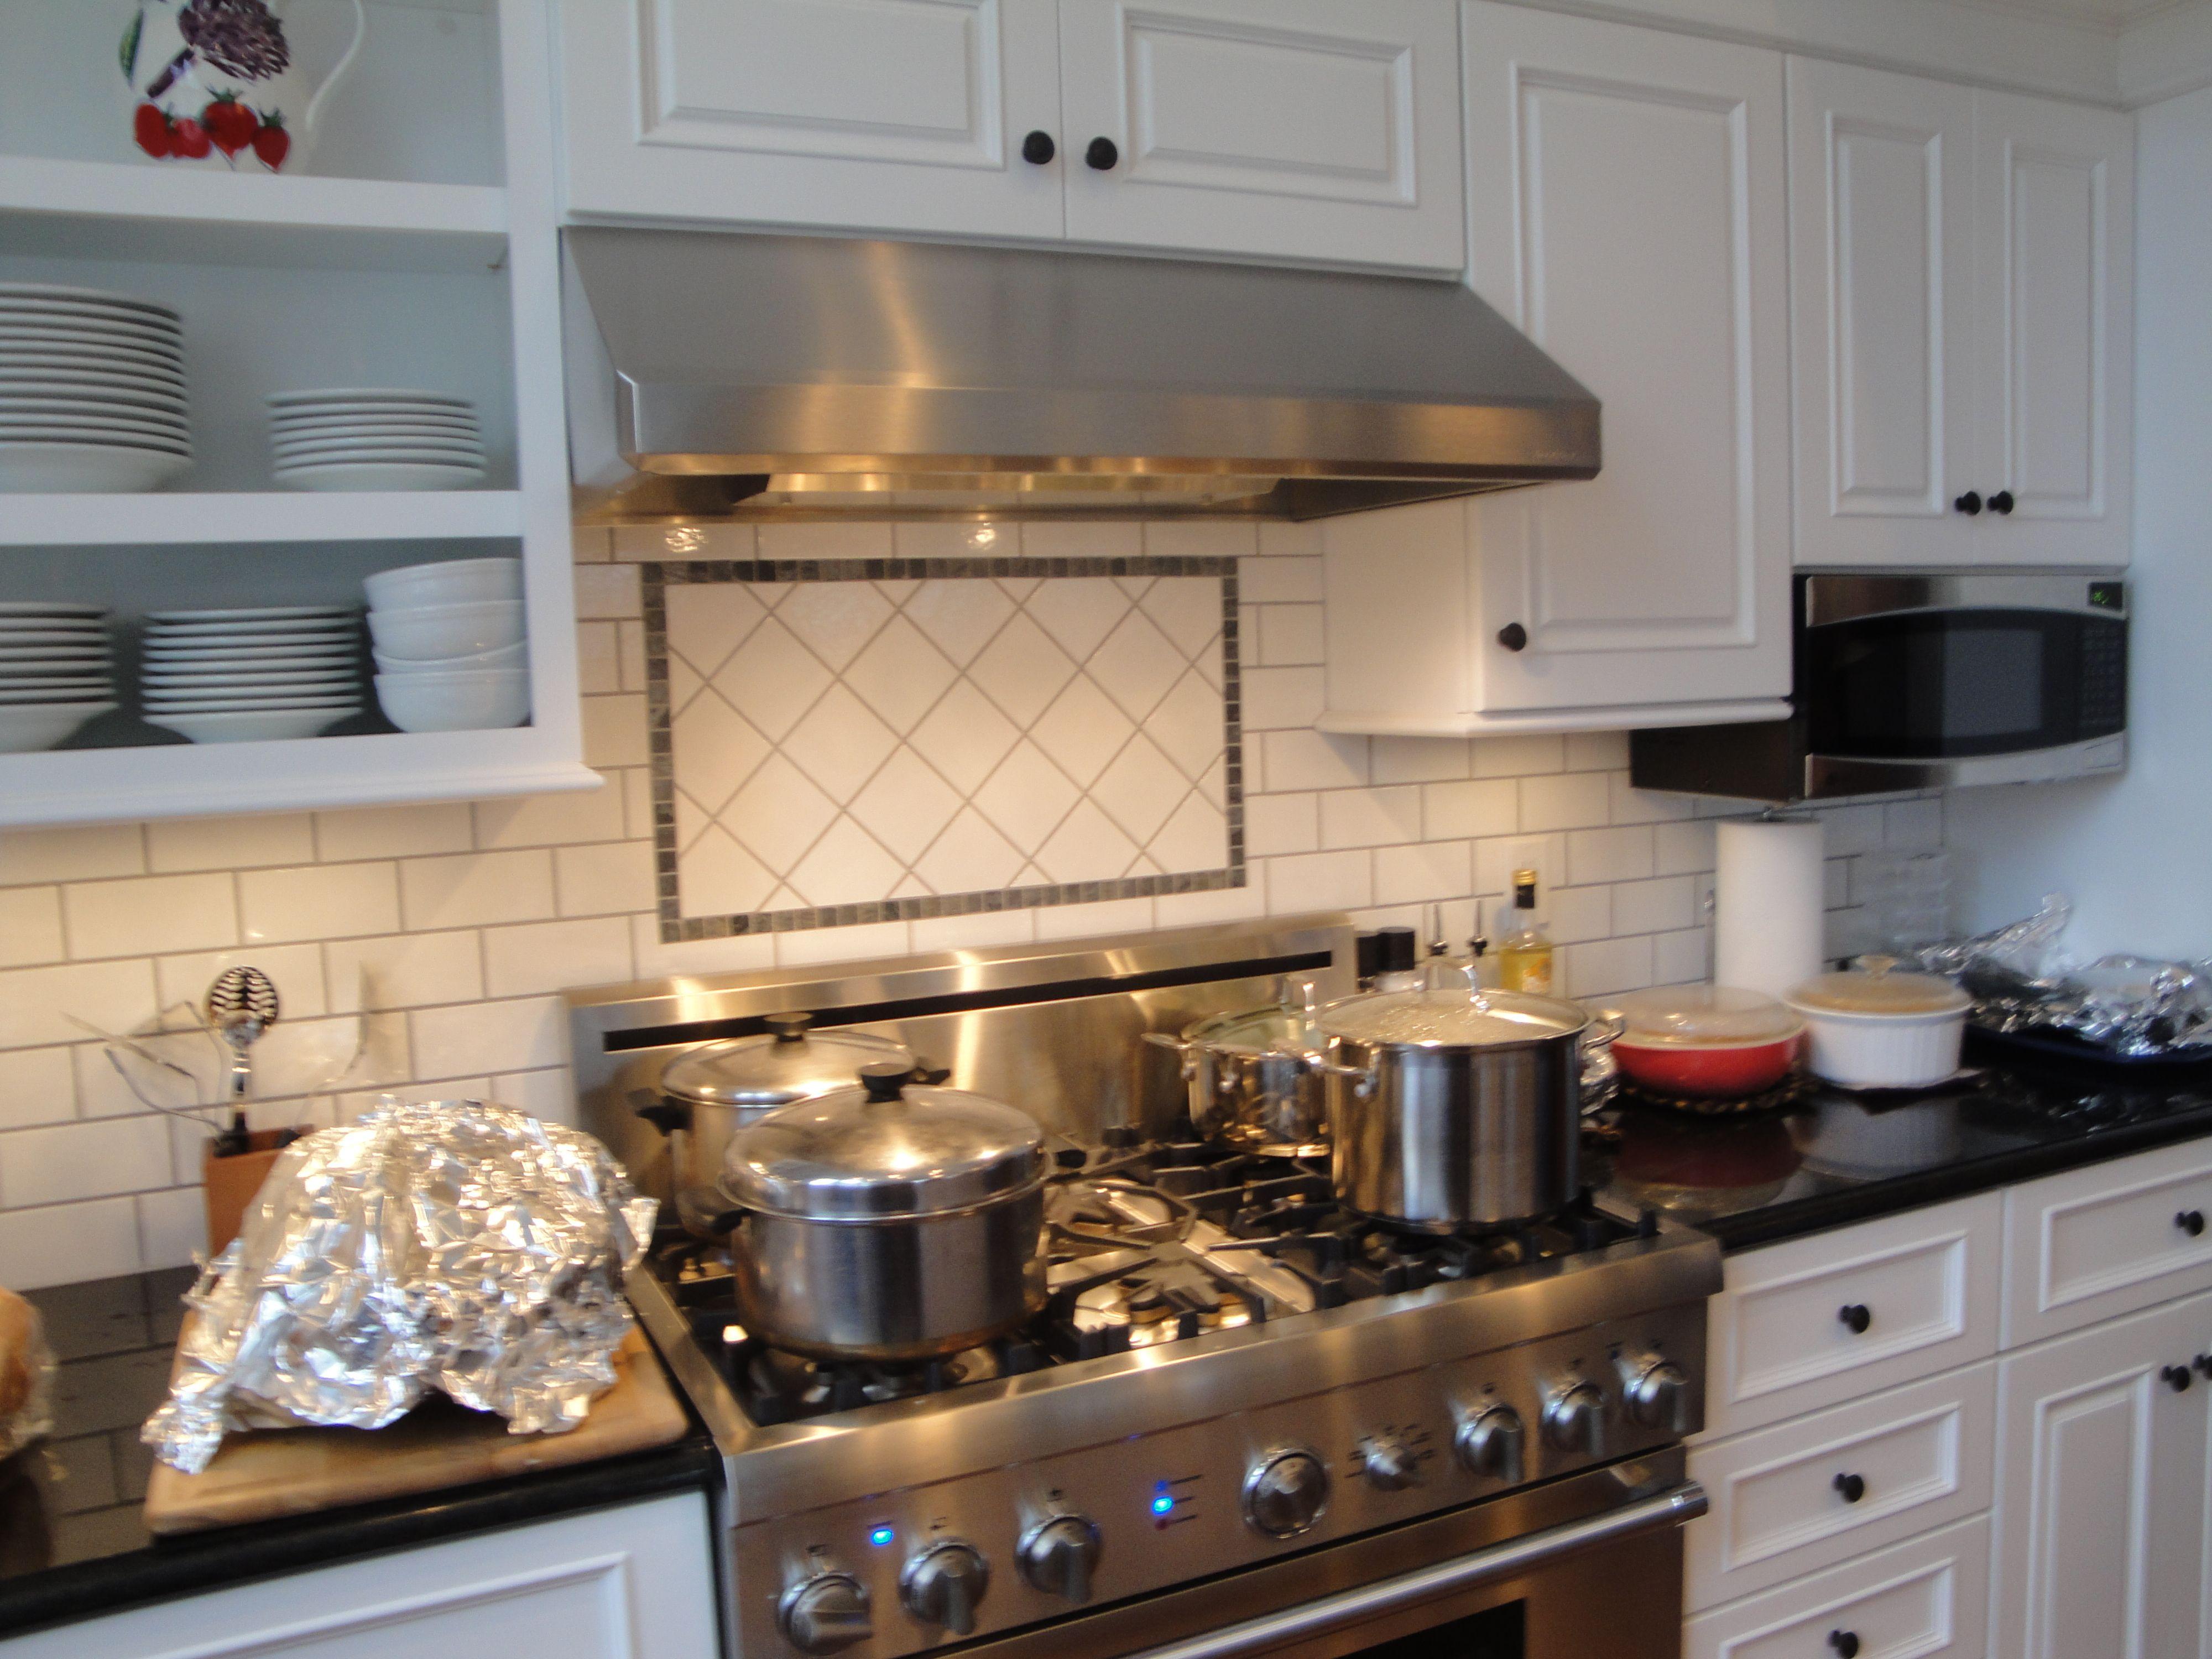 range backsplash kitchen renovation ideas pinterest